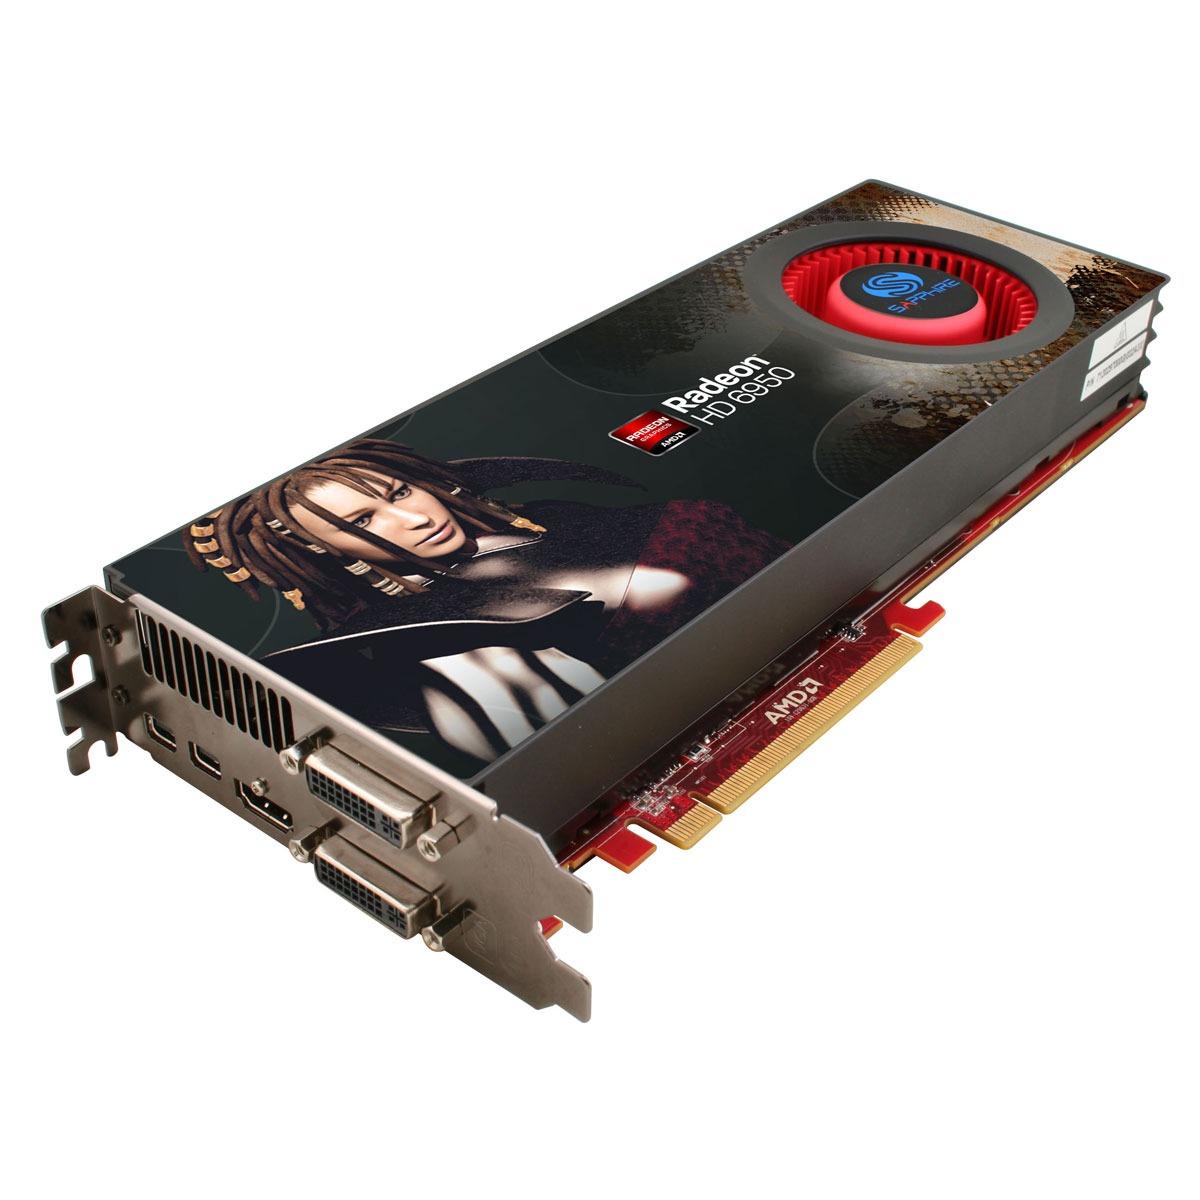 Carte graphique Sapphire Radeon HD 6950 2 GB Sapphire Radeon HD 6950 - 2 Go HDMI/Dual DVI/Dual Mini-DisplayPort - PCI Express (AMD Radeon HD 6950)